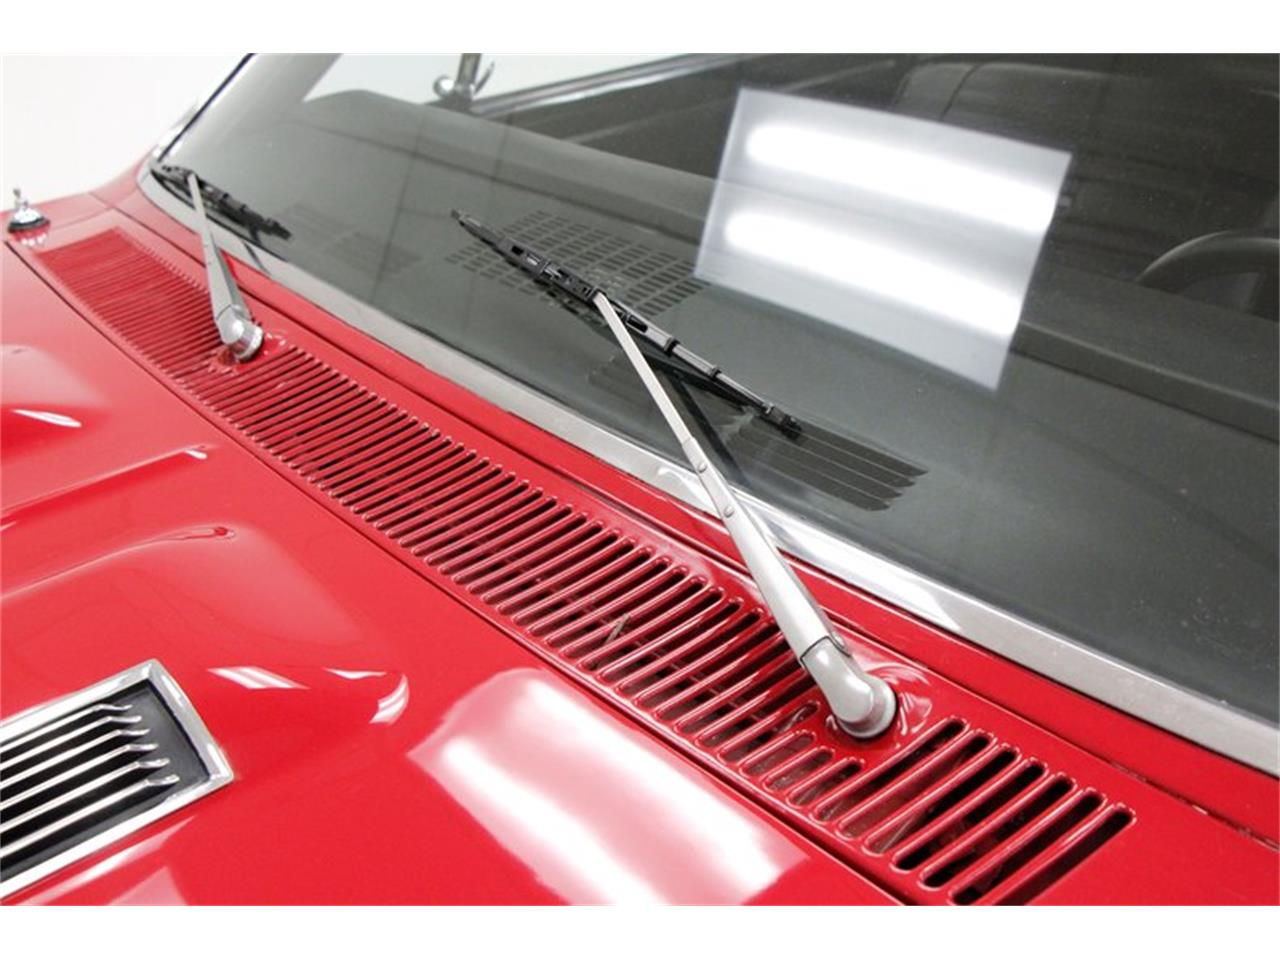 1967 Chevrolet Chevelle (CC-1303441) for sale in Morgantown, Pennsylvania